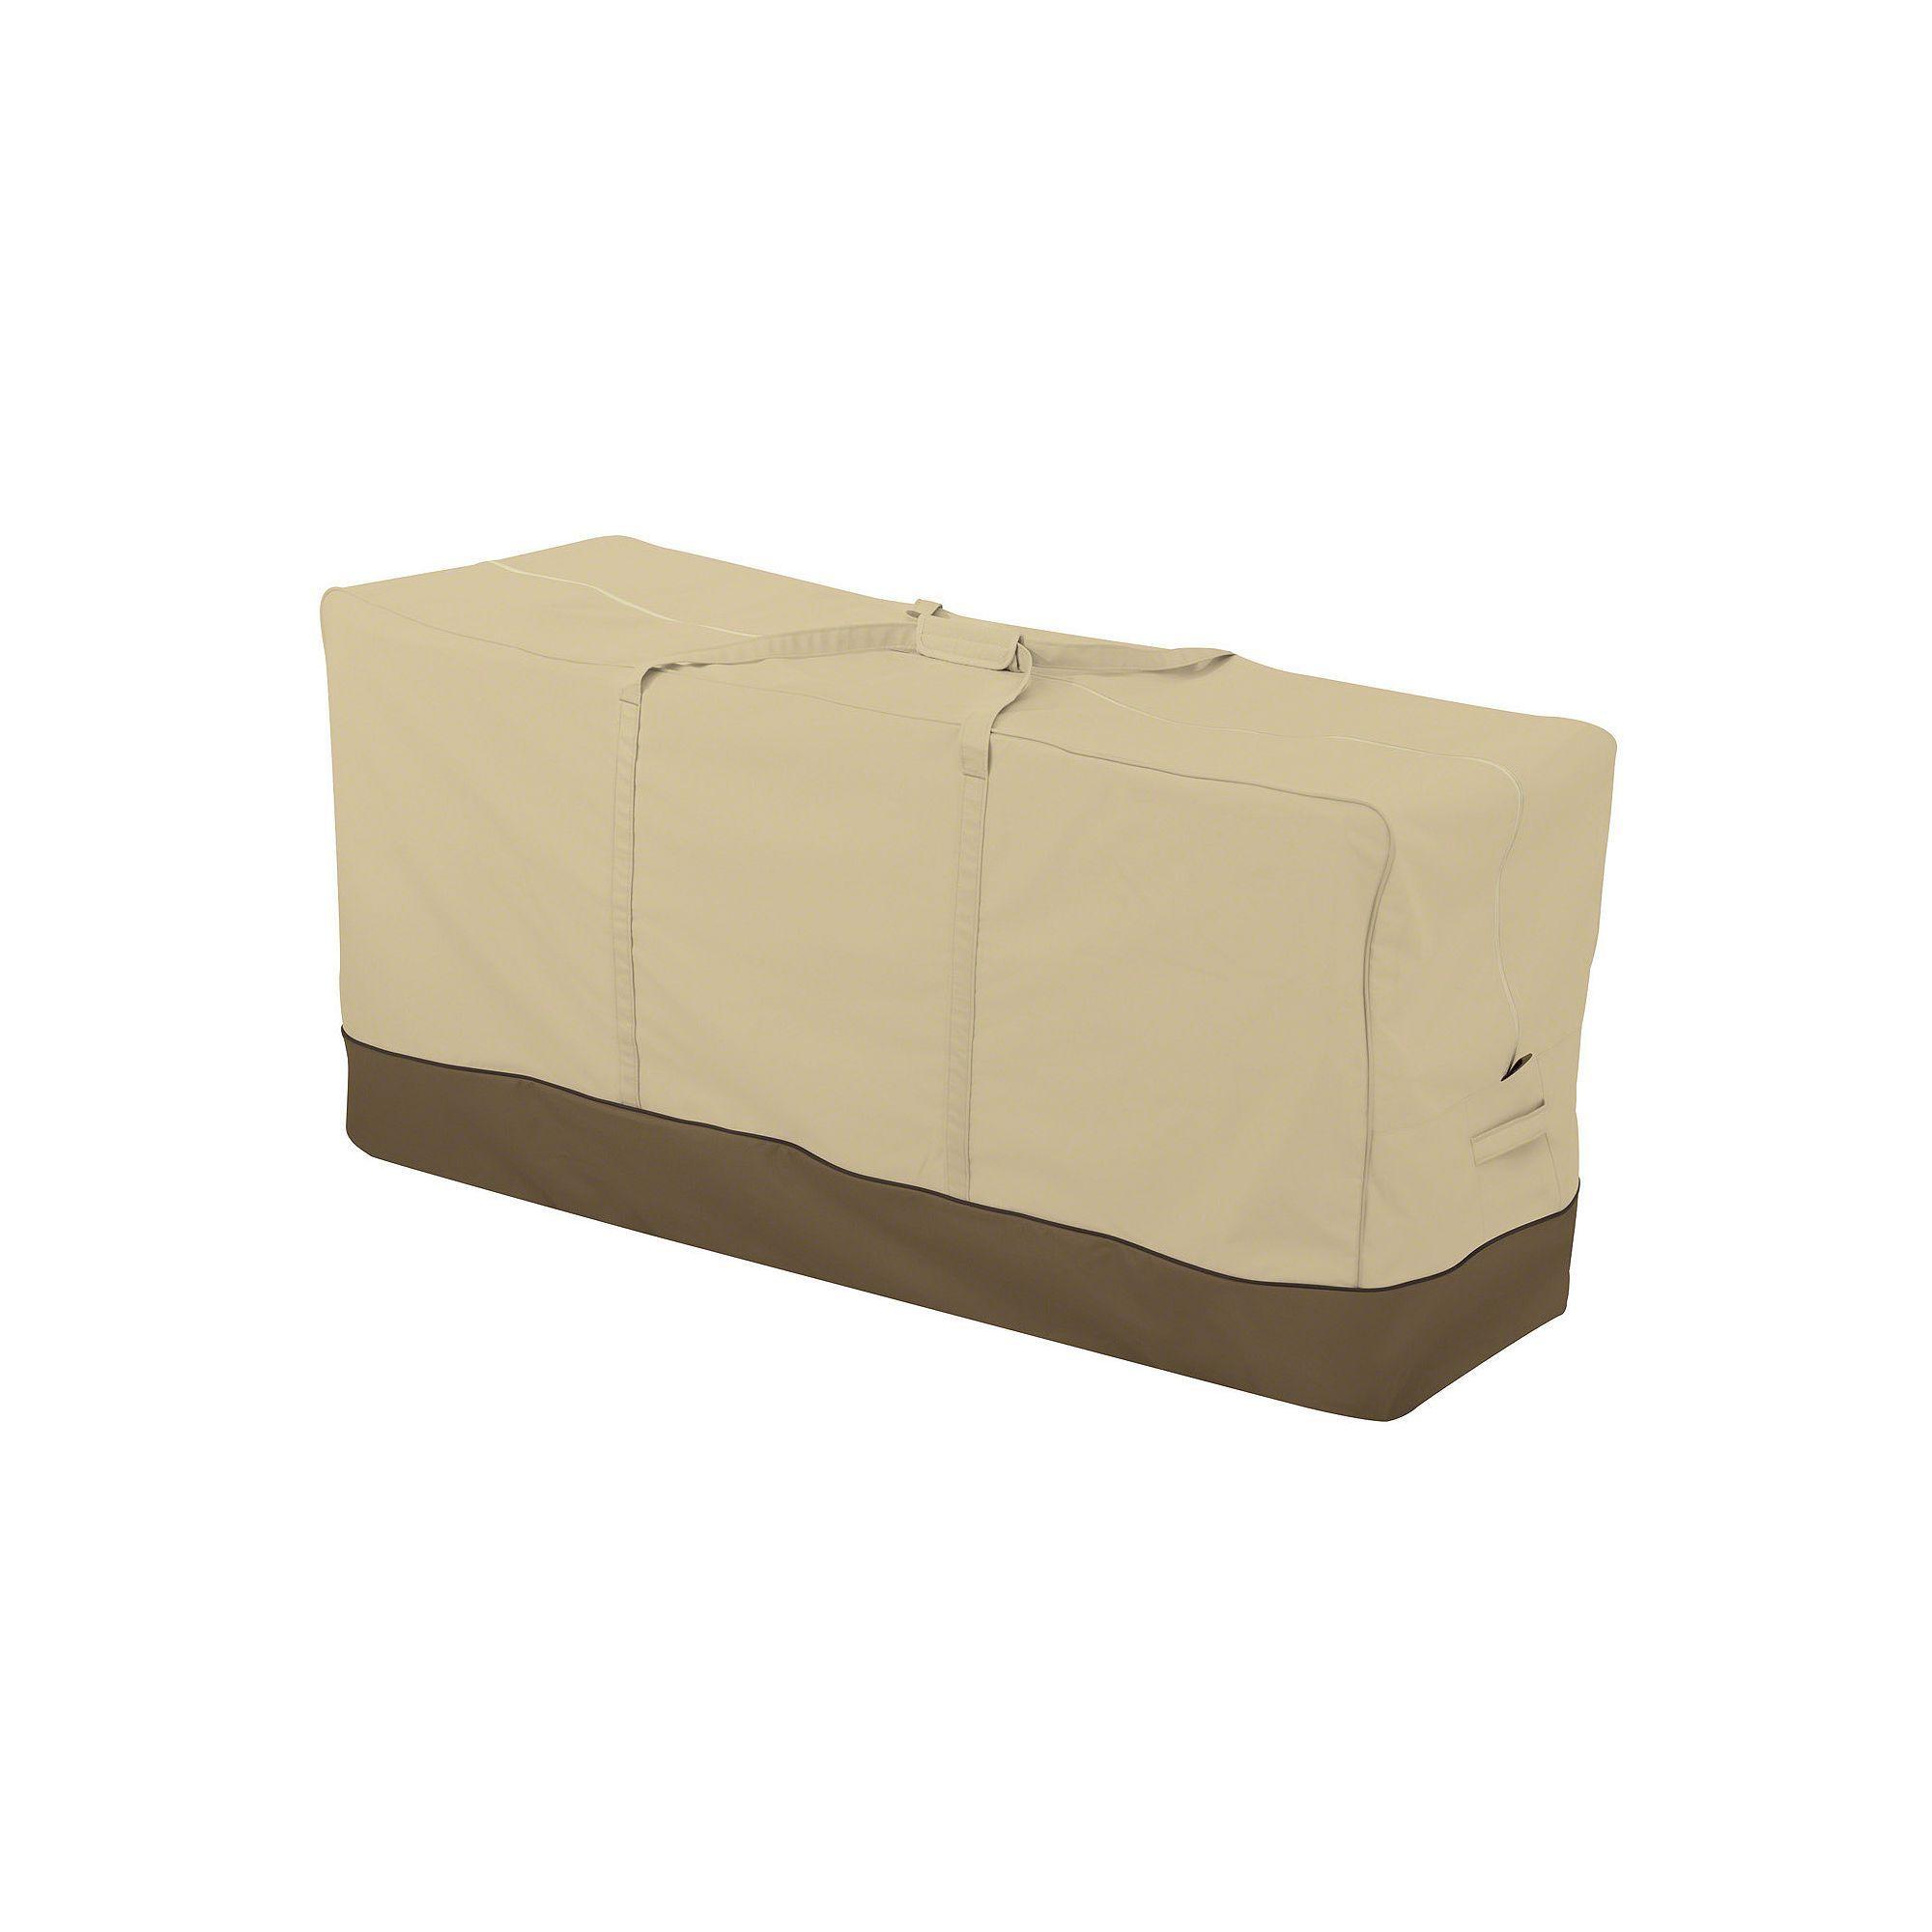 Classic Accessories Veranda Oversized Patio Cushion Storage Bag Patio Cushions Patio Cushion Storage Outdoor Furniture Covers